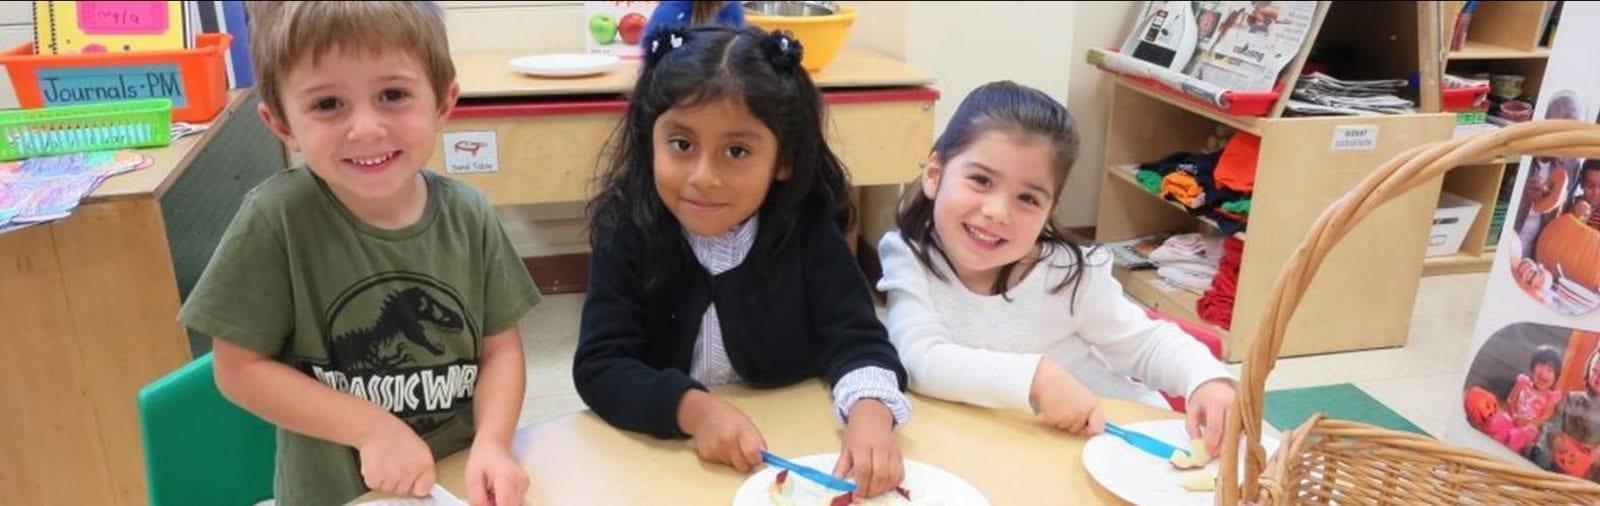 child care education enrichment westfield area ymca